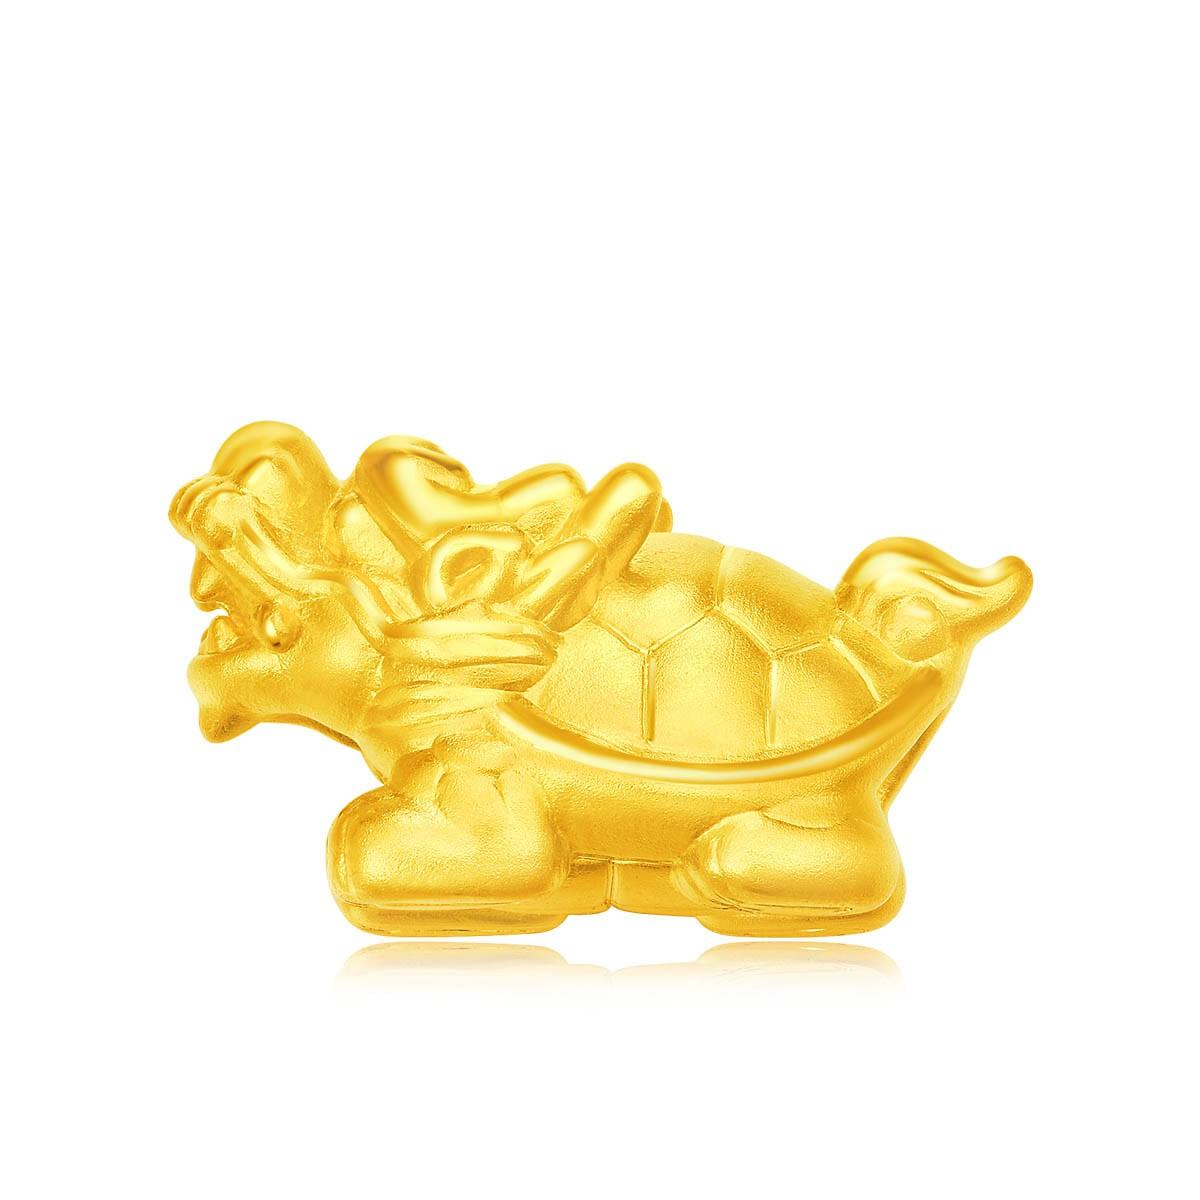 24K Pure Gold Pendant(20607)